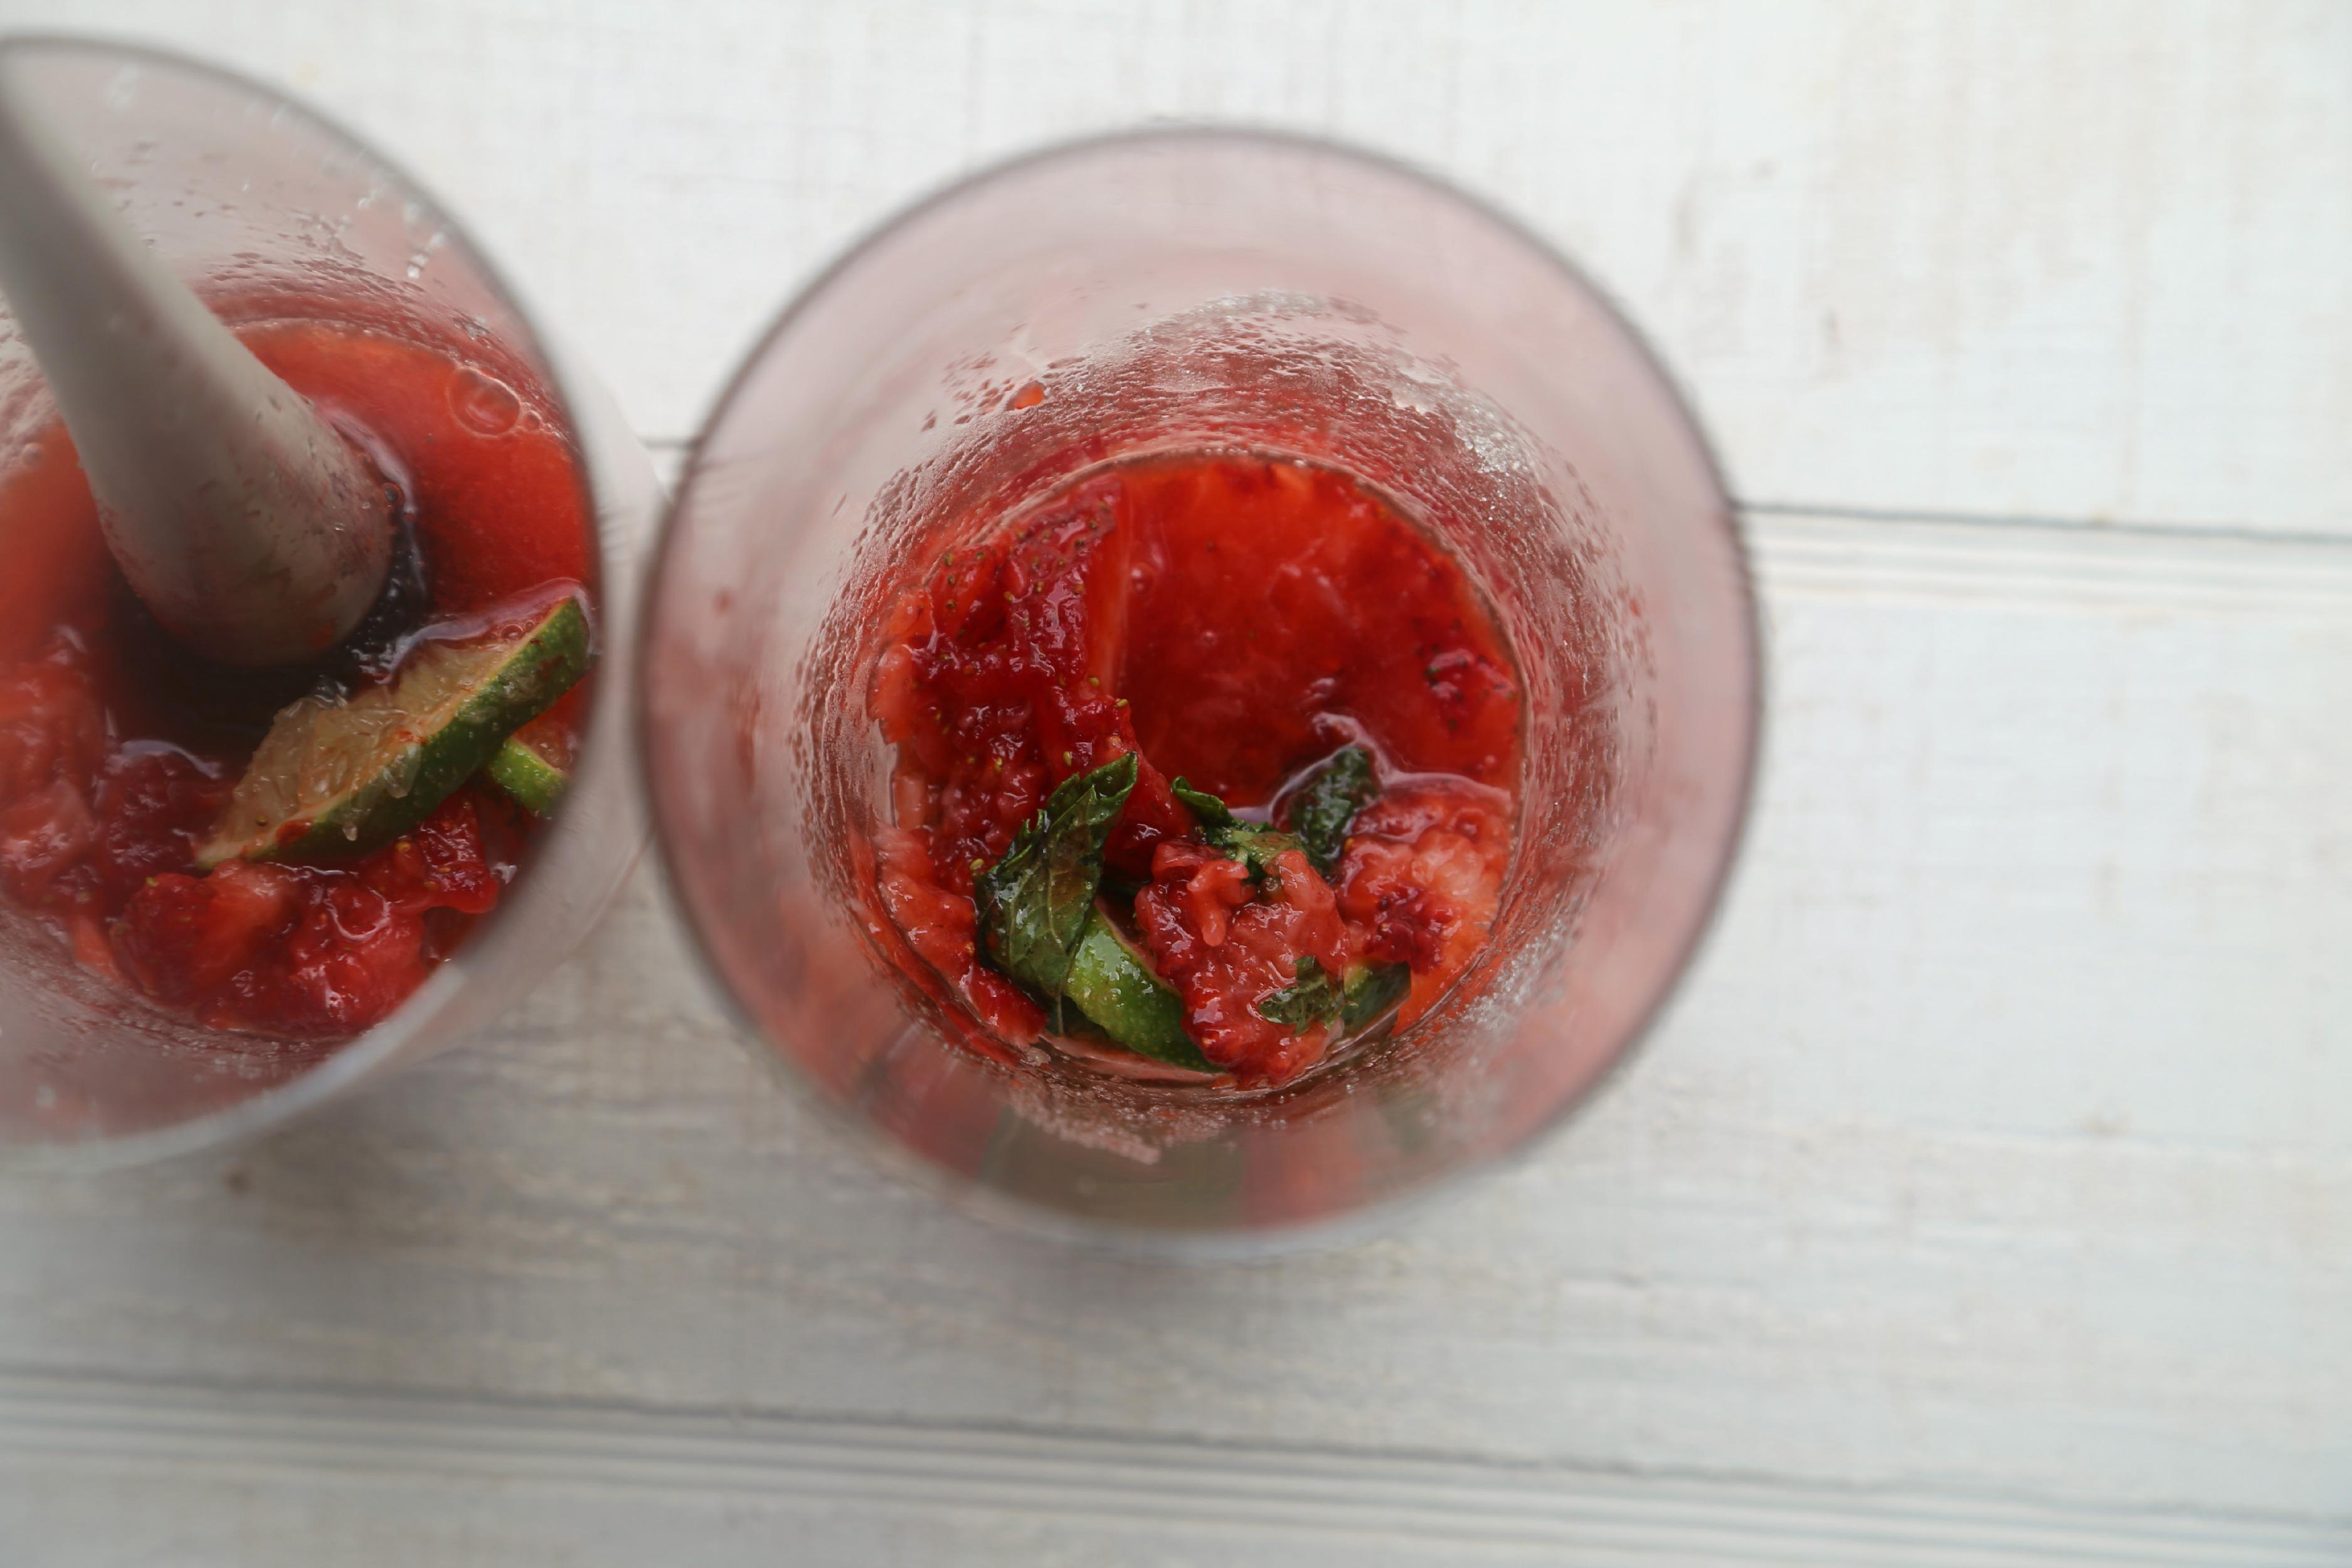 mudle-mojito-how-to-strawberry-mojito-vianneyrodriguez-sweetlifebake